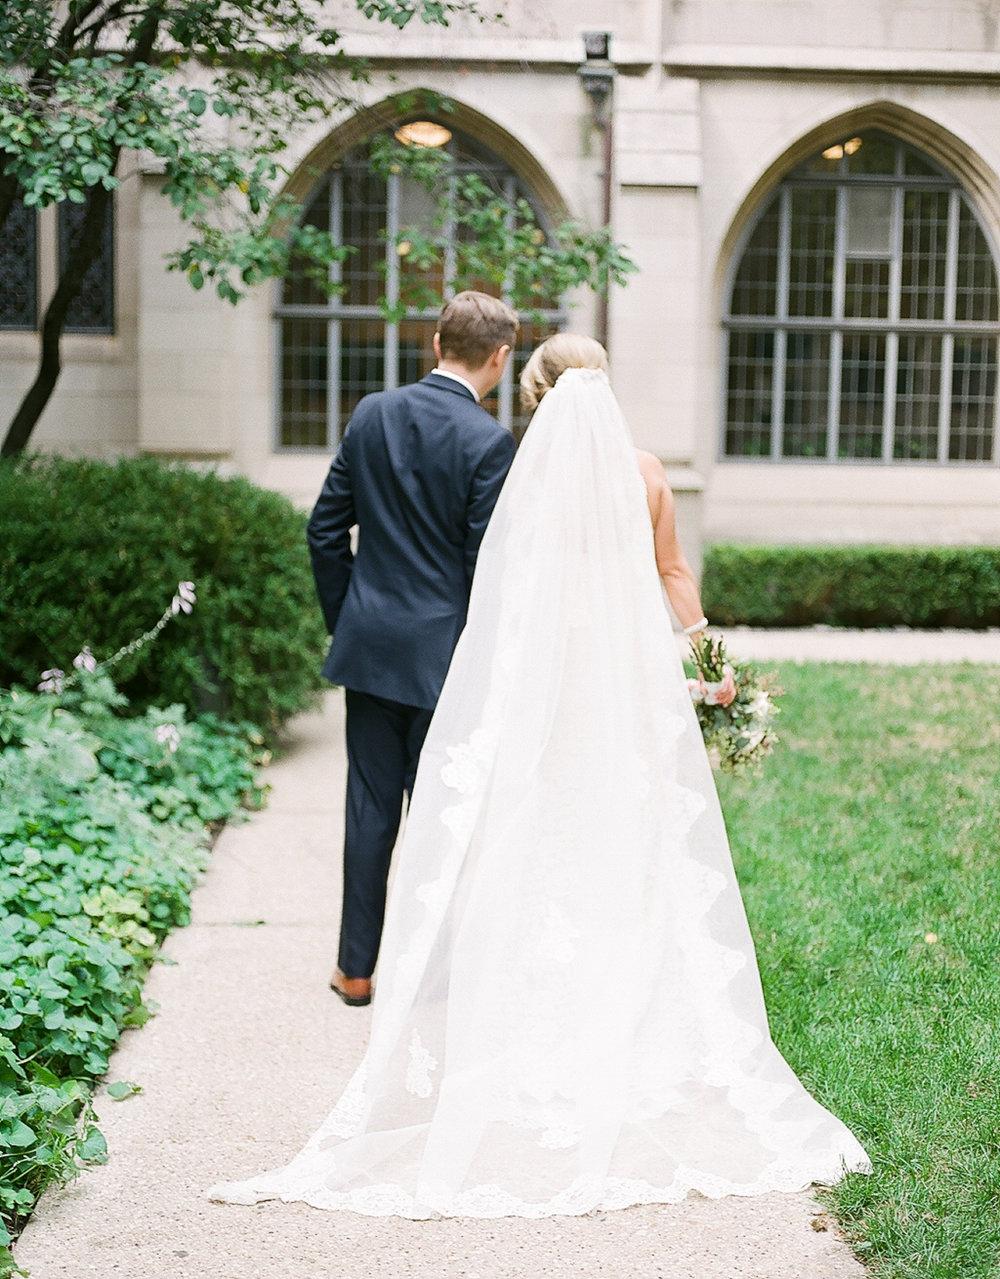 Bonphotage Fine Art Film Wedding Photography